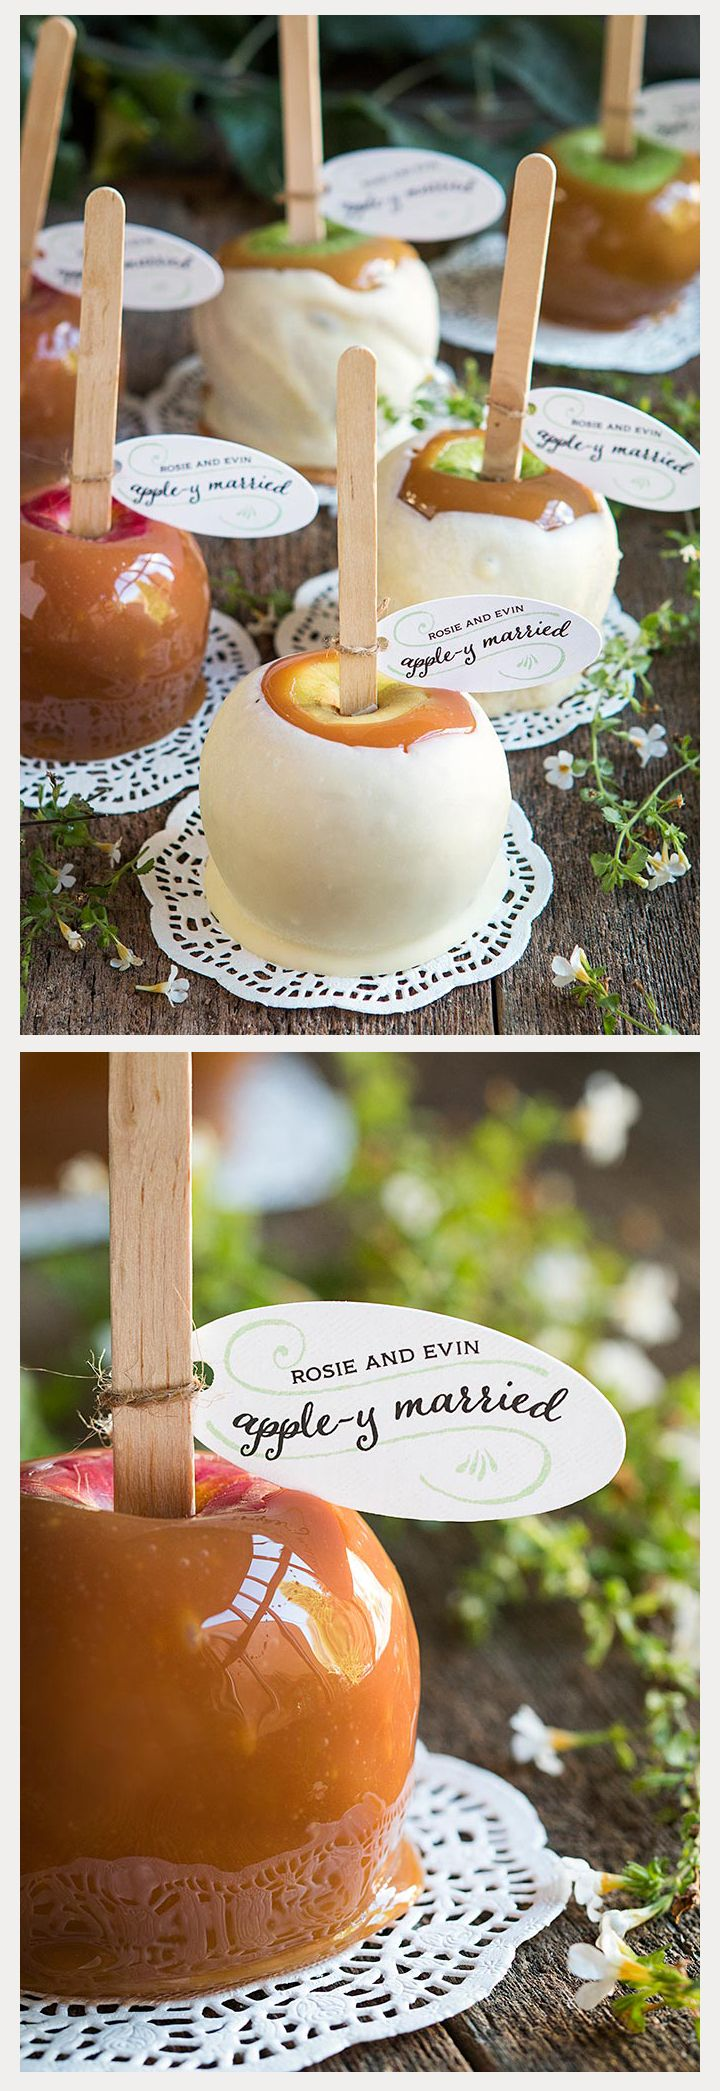 25 Tasty Caramel and Candy Apples - caramel apple wedding favors